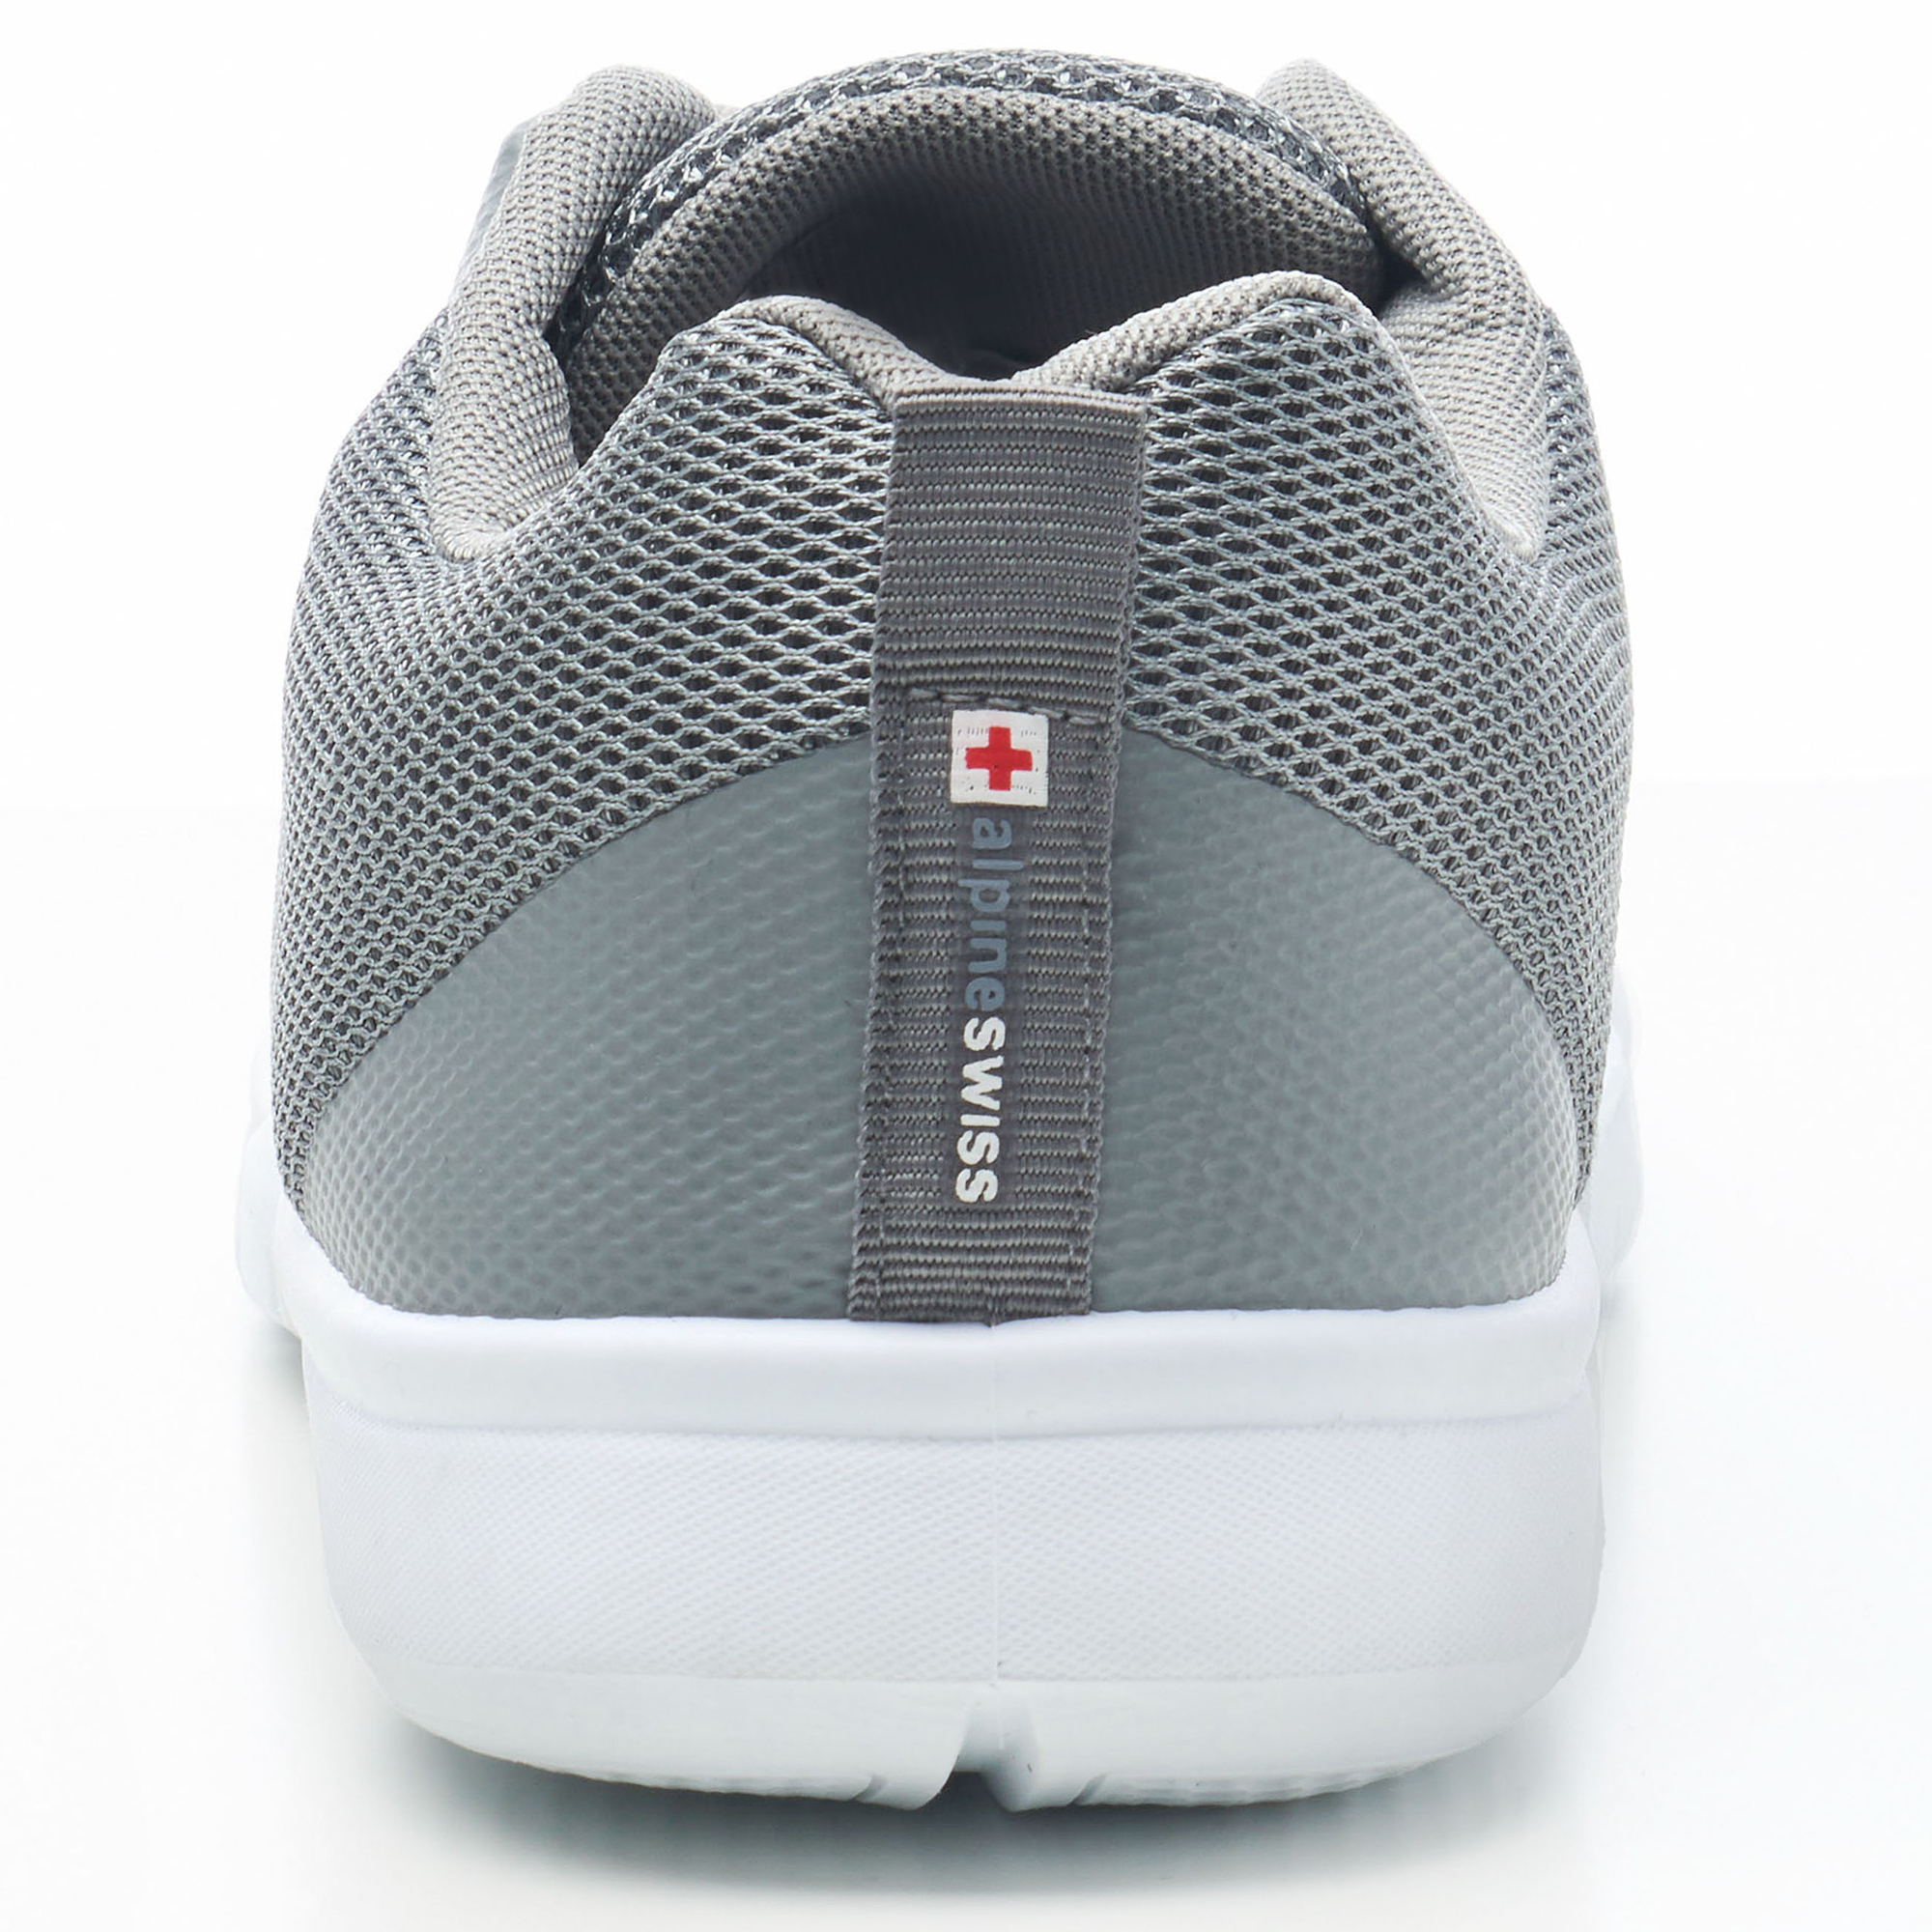 thumbnail 23 - Alpine Swiss Bolt Mesh Sneaker Casual Light Shoes For Men With Shoe Bag